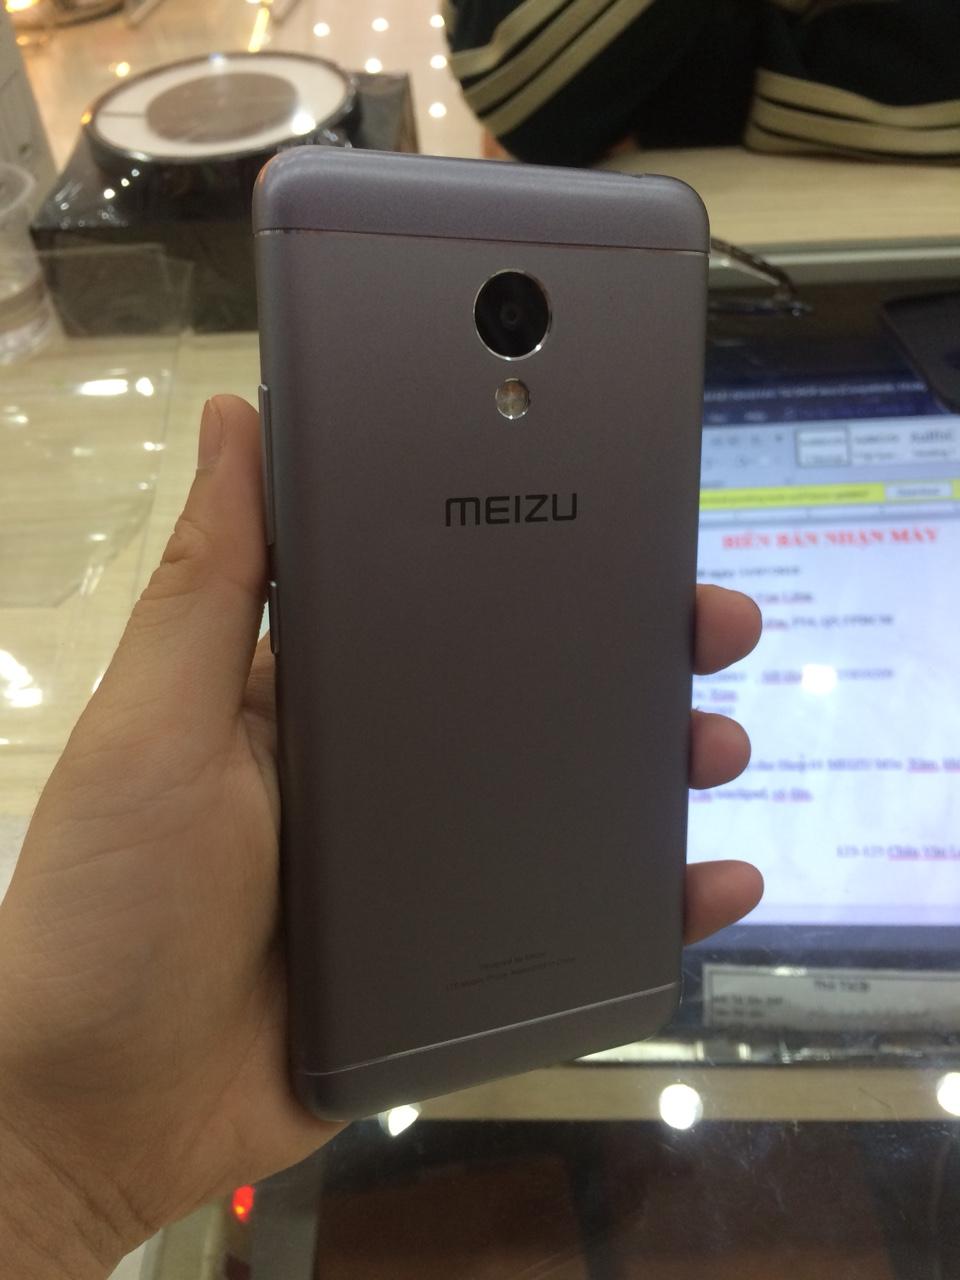 Meizu M3s Body (1).jpg